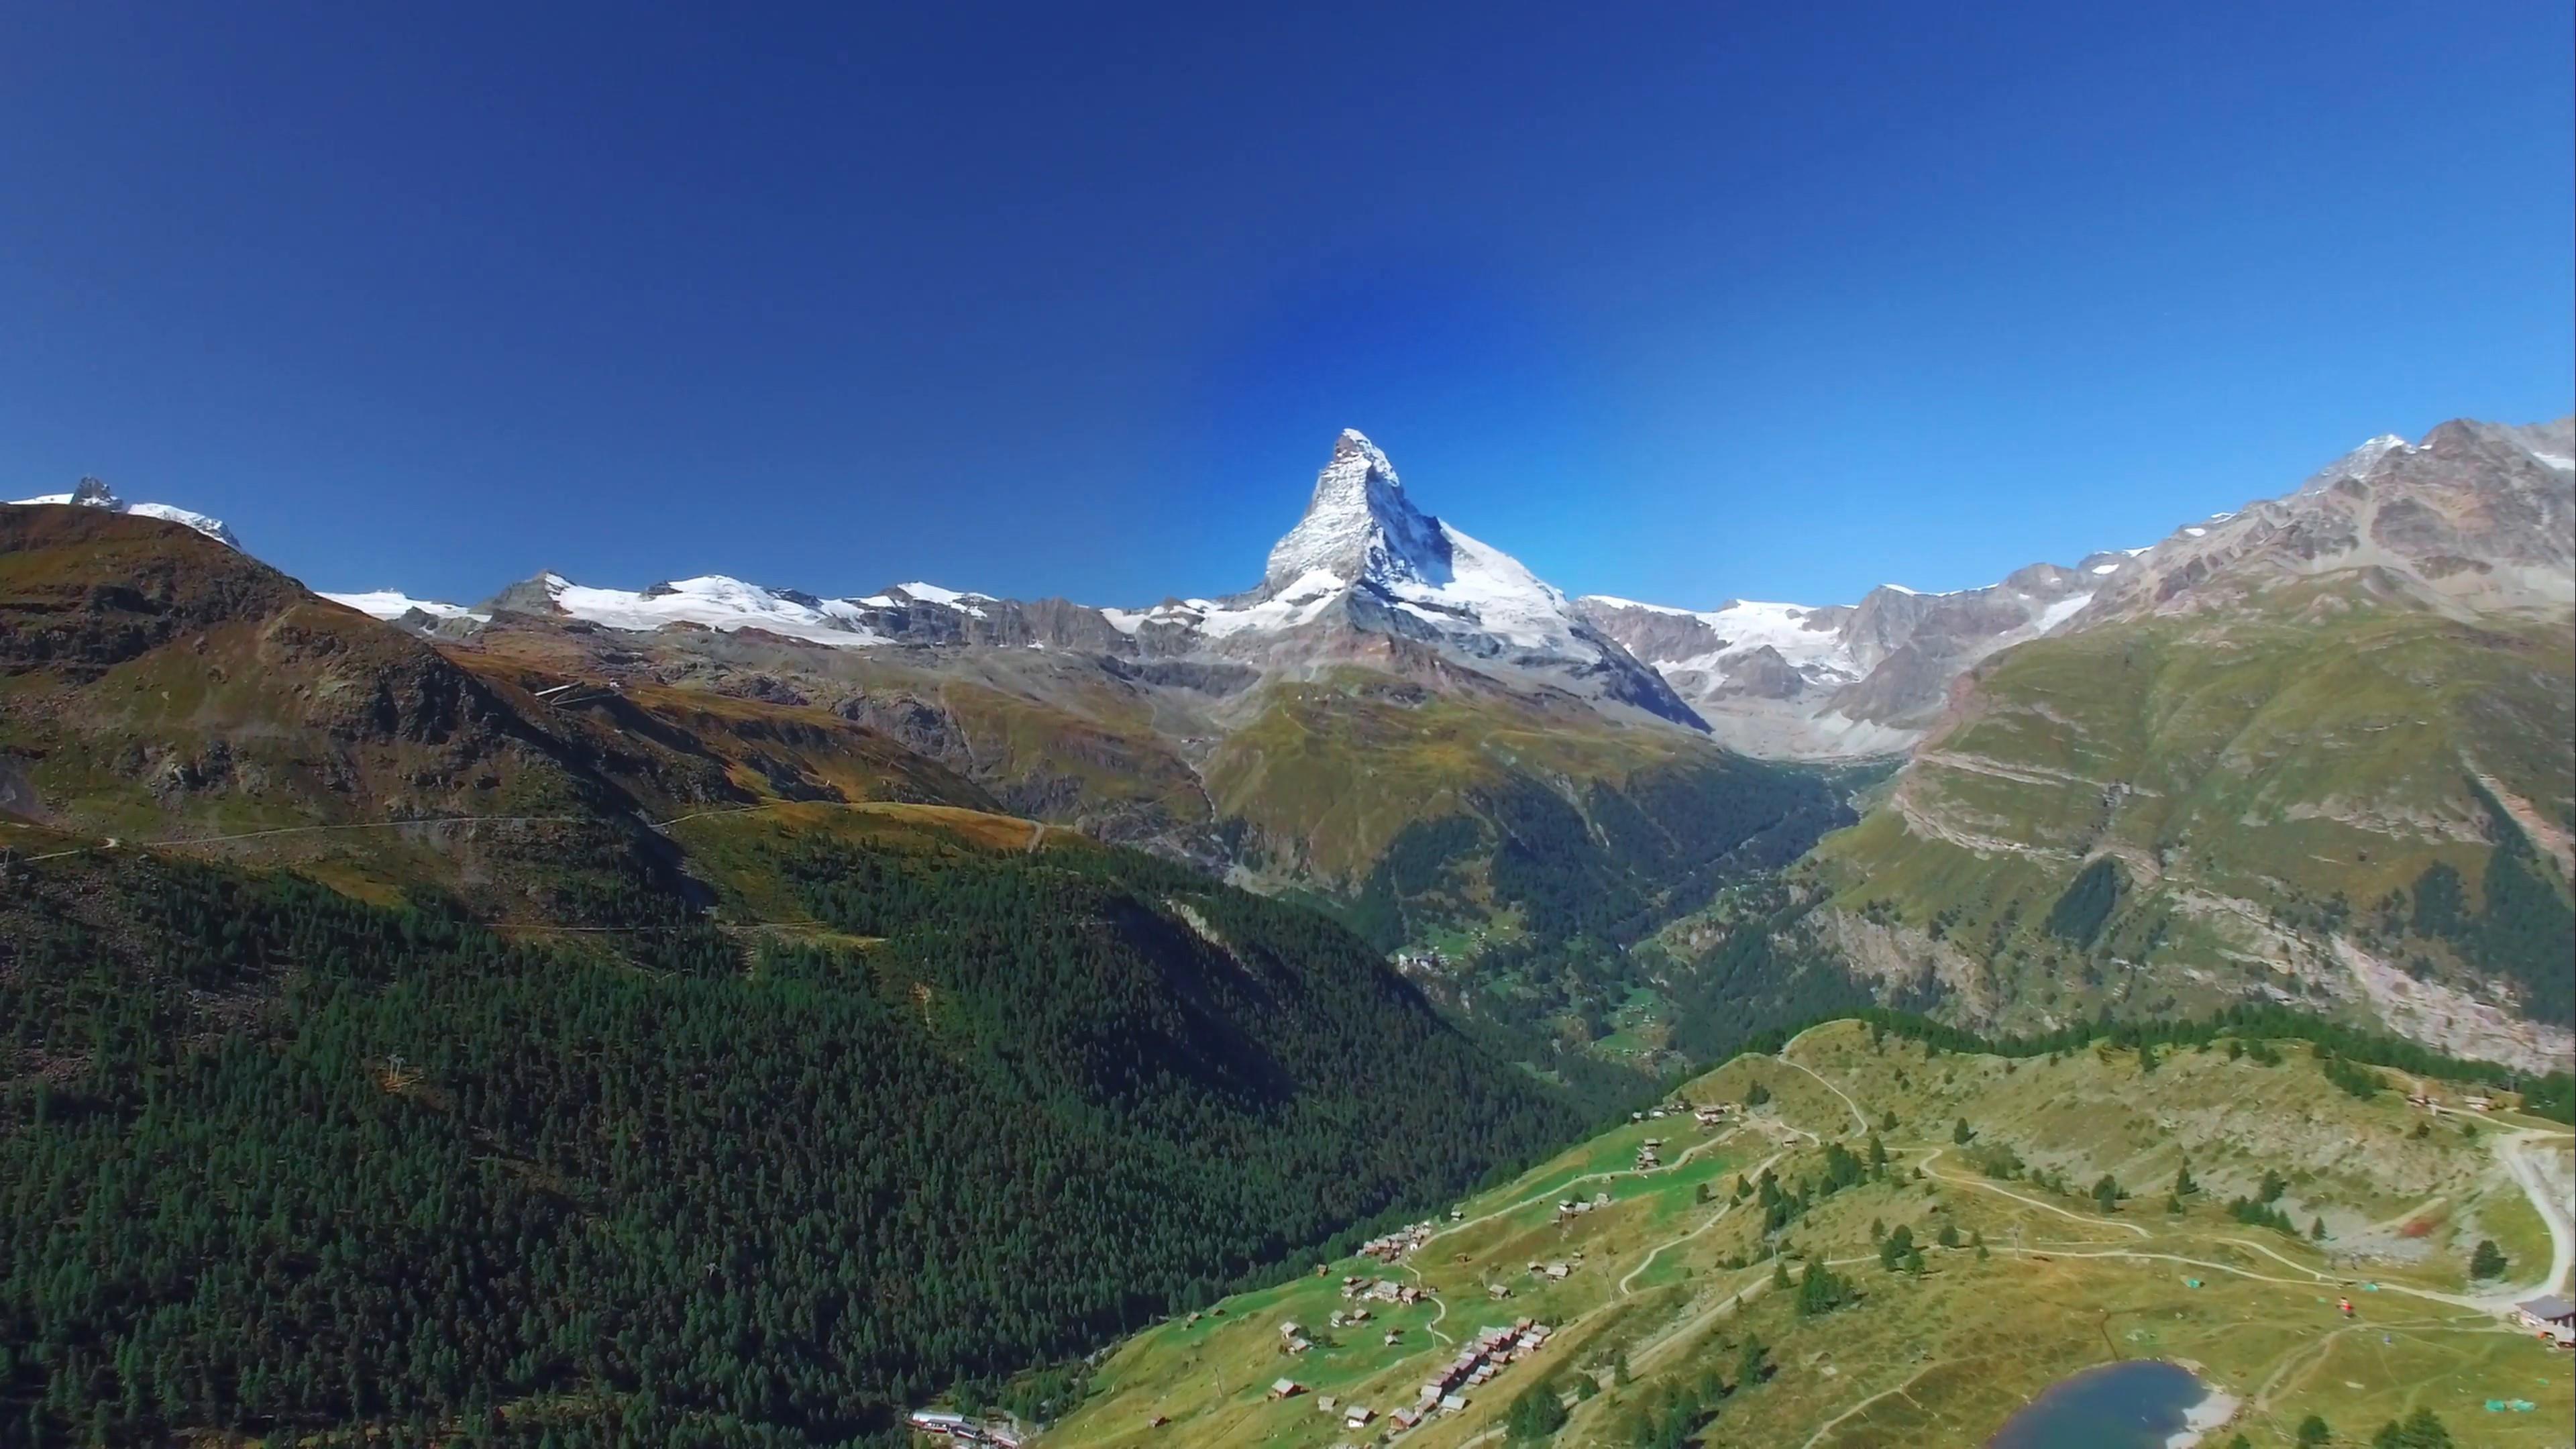 Matterhorn Mountain  - Switzerland's most famous landmark and symbol wallpaper